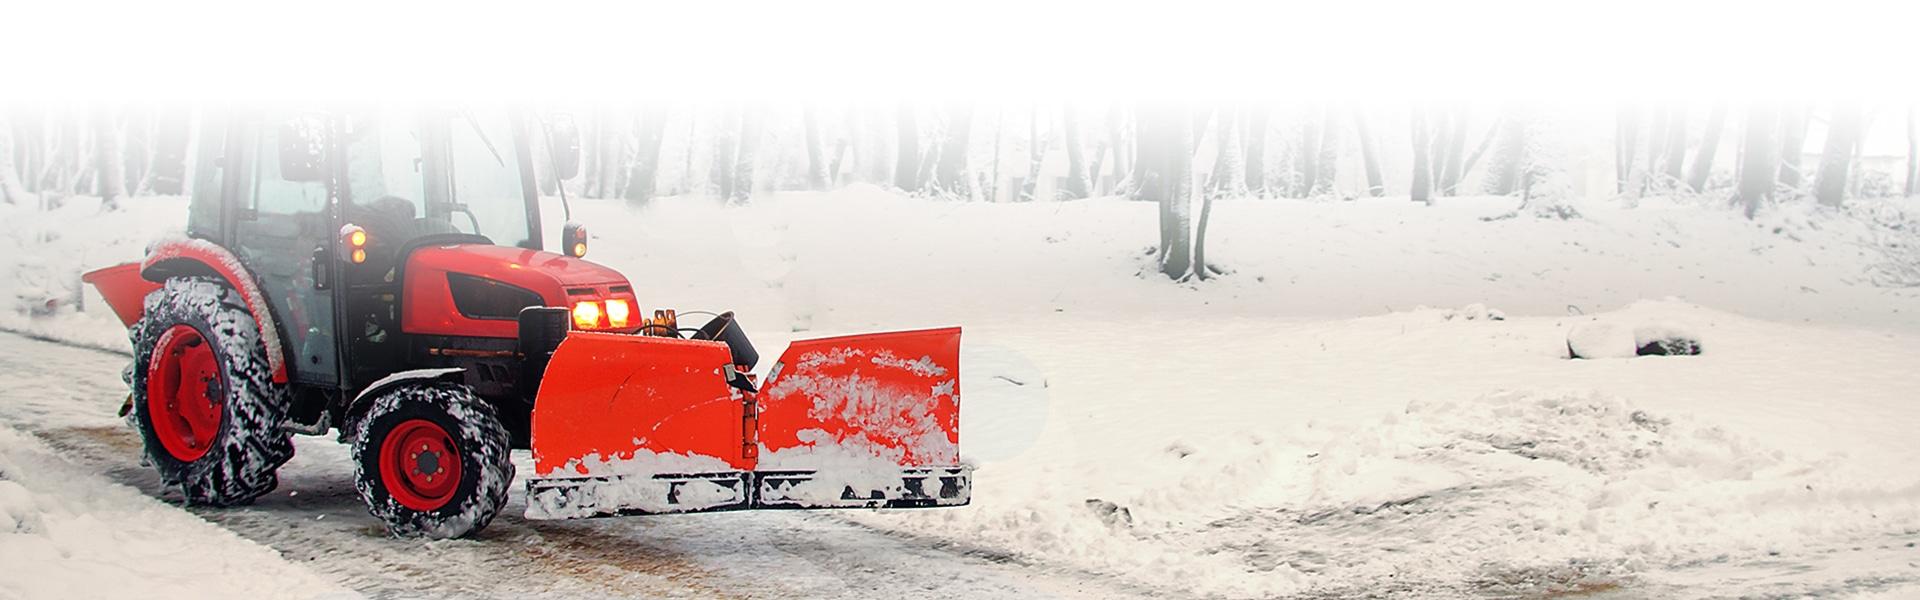 Fahrzeug was gerade Schnee beräumt